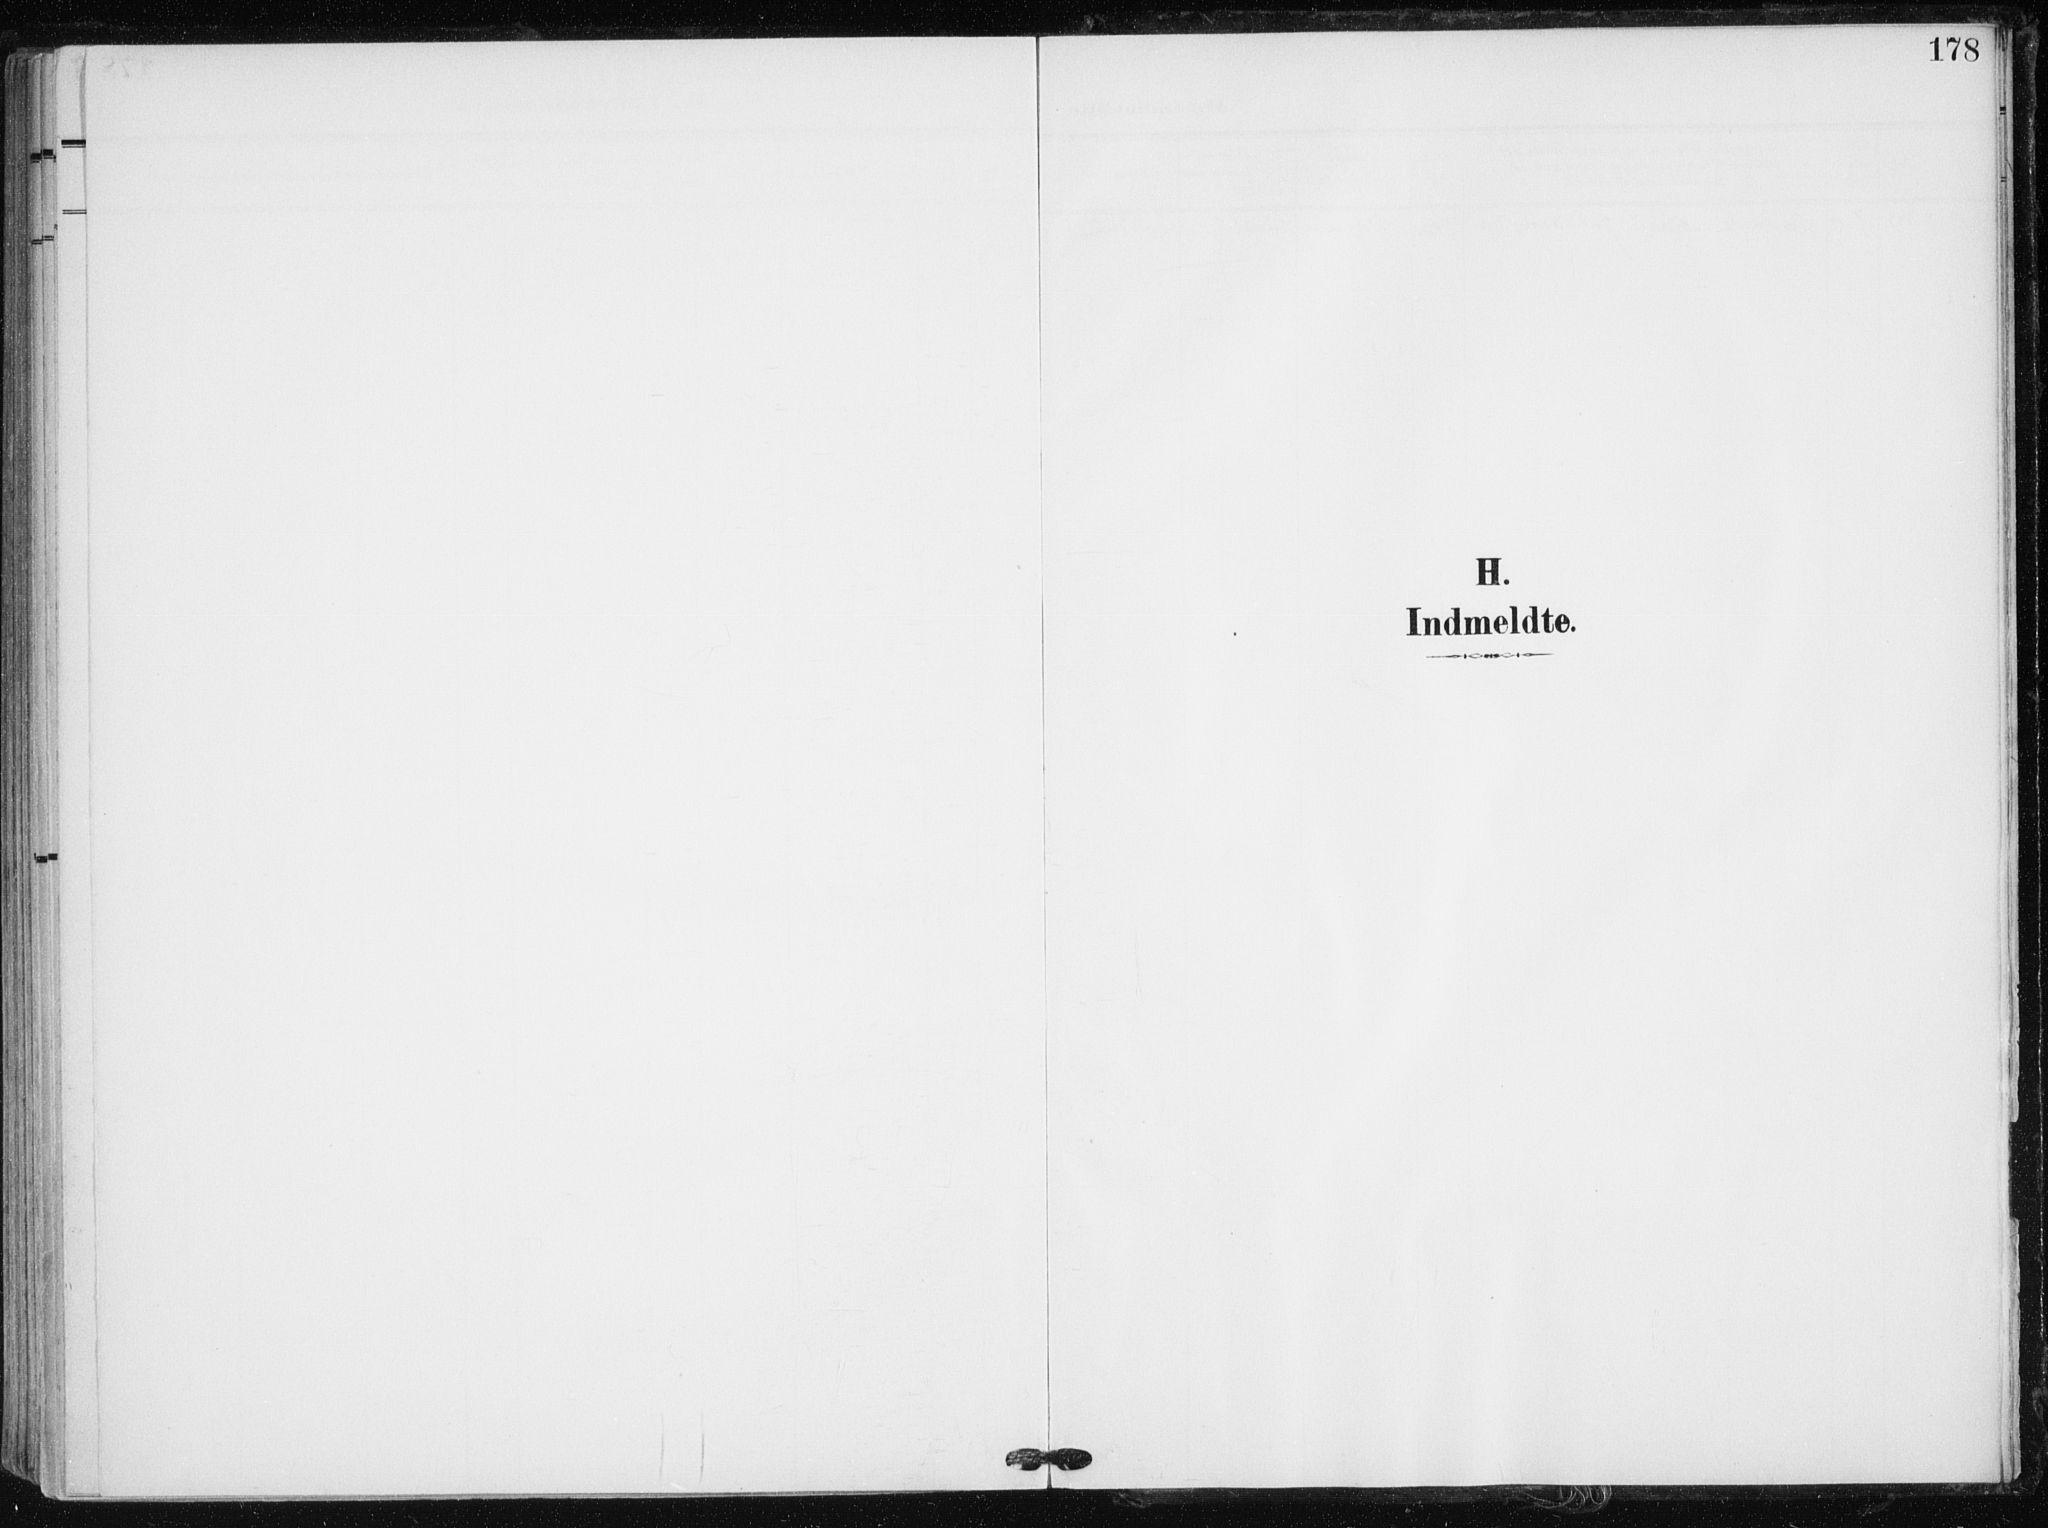 SATØ, Tranøy sokneprestkontor, I/Ia/Iaa/L0012kirke: Ministerialbok nr. 12, 1905-1918, s. 178